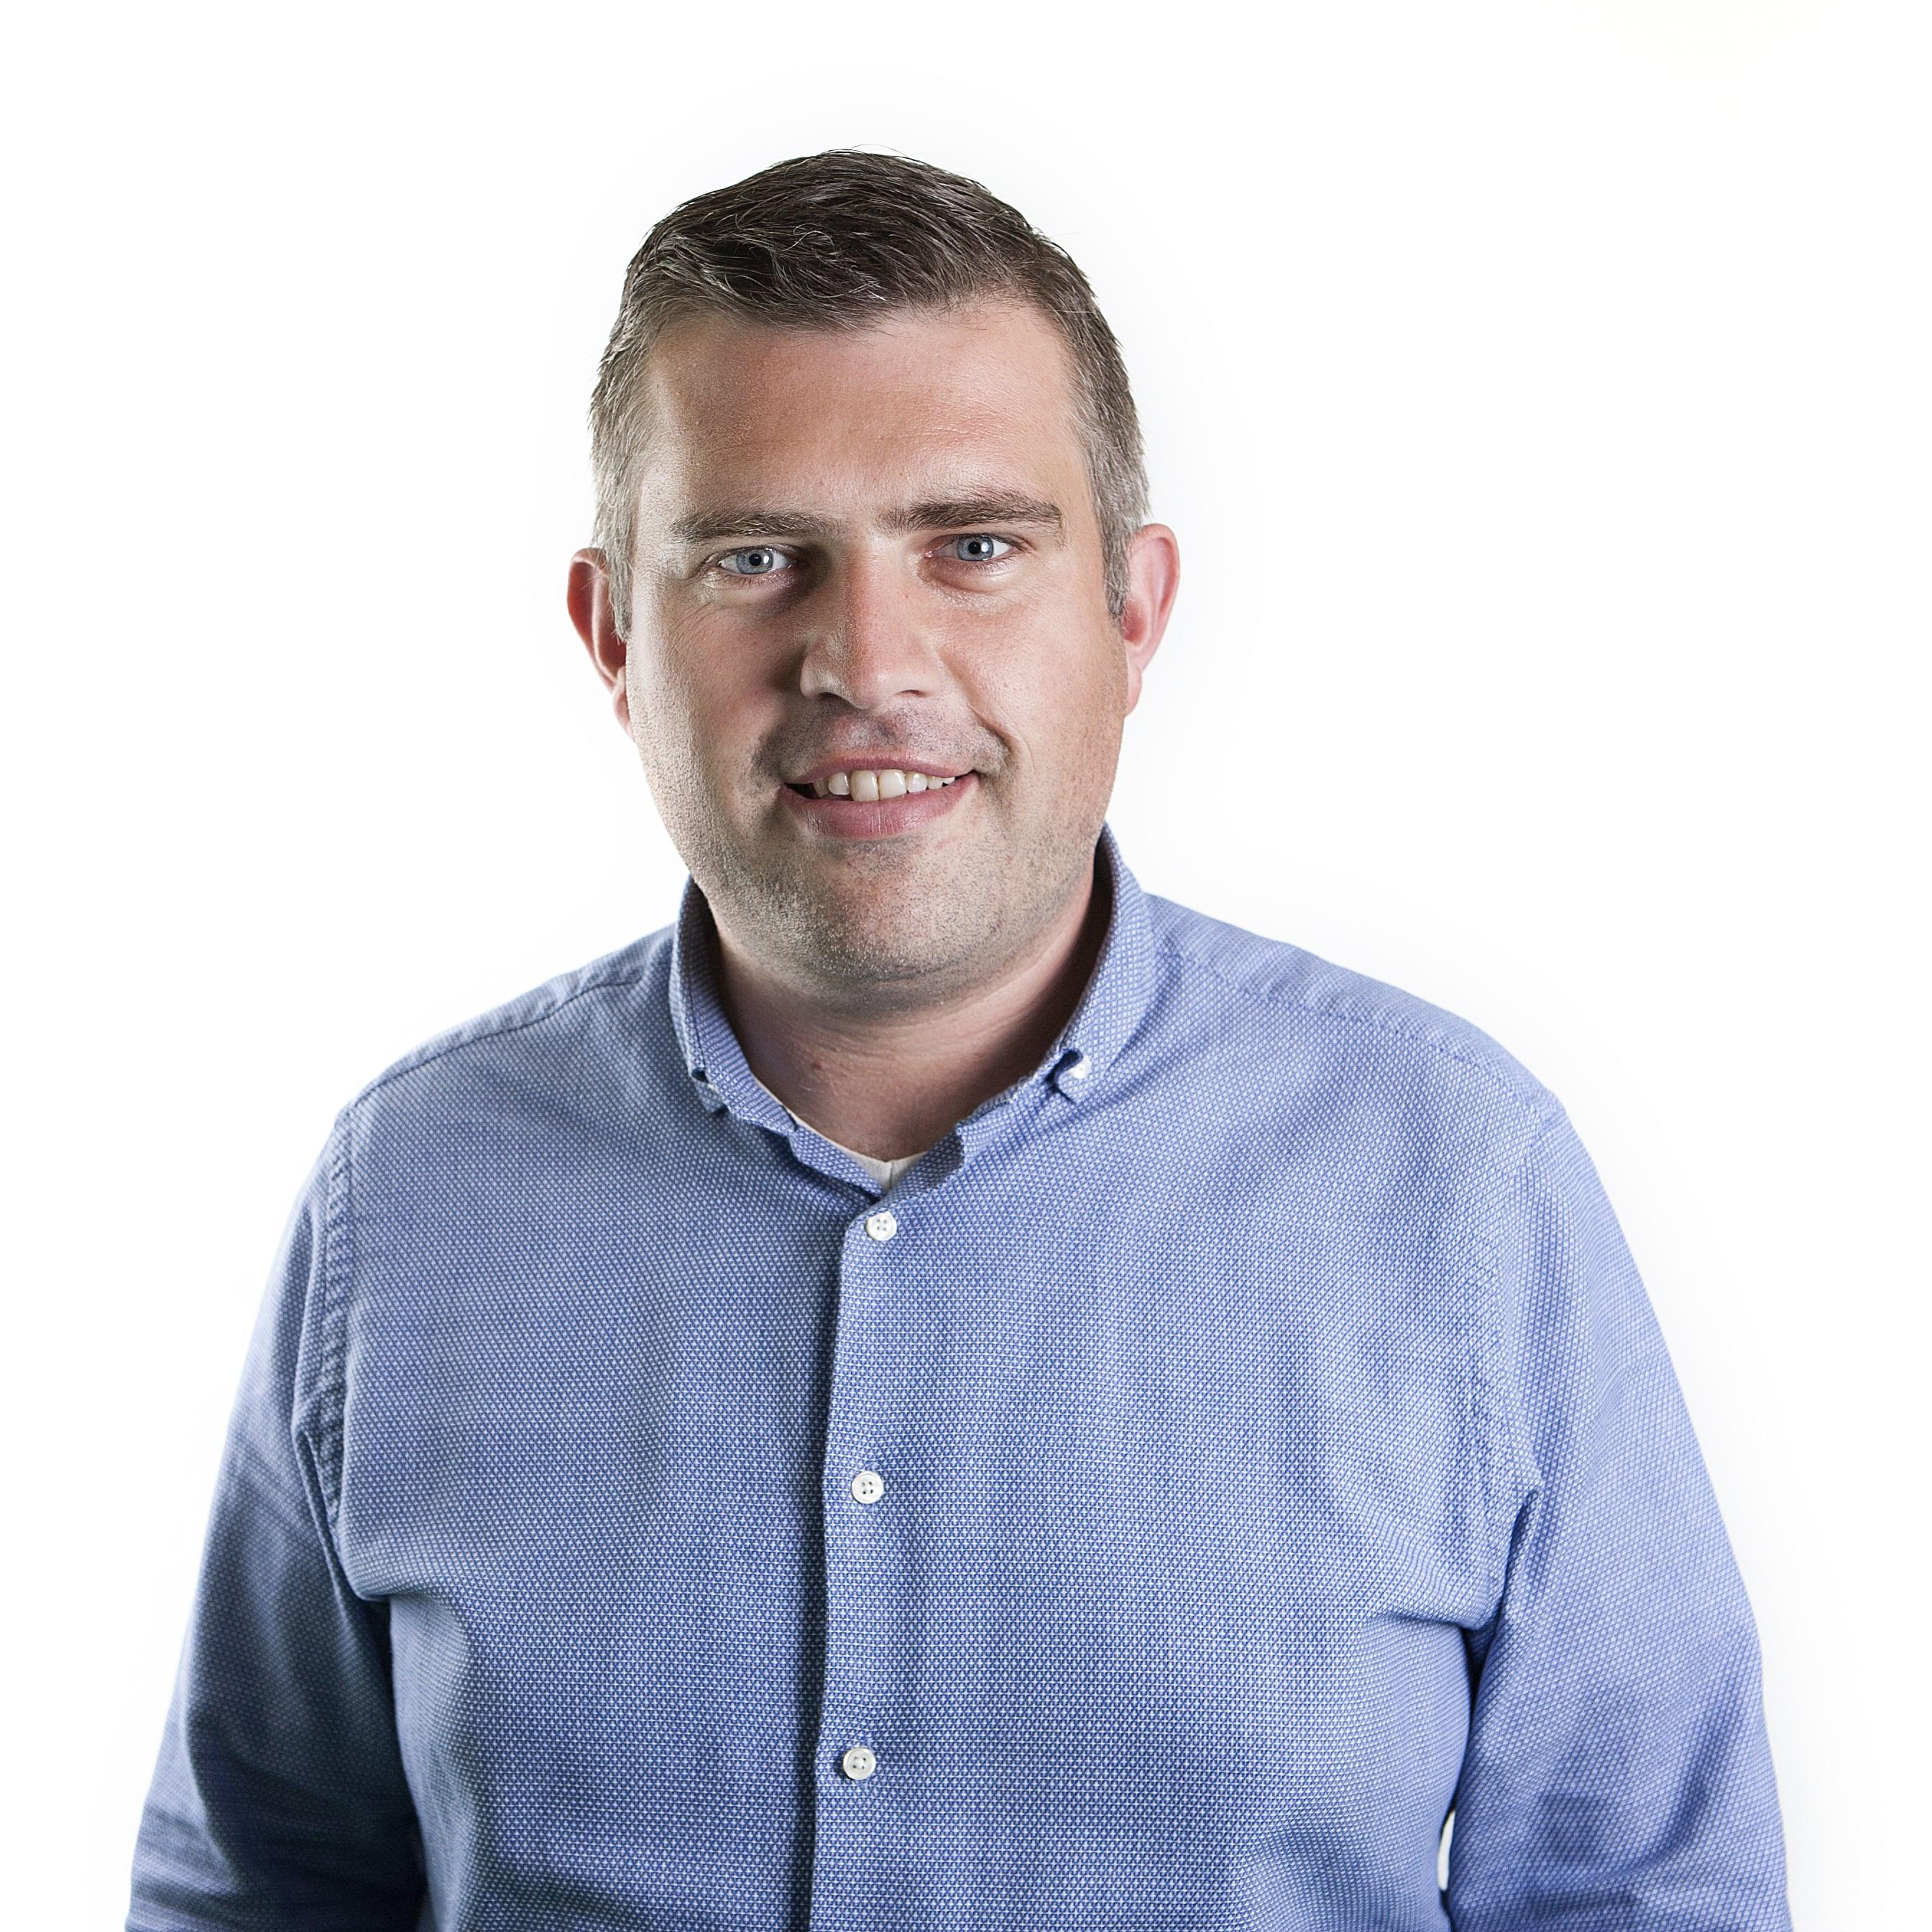 Christiaan Evenhuis